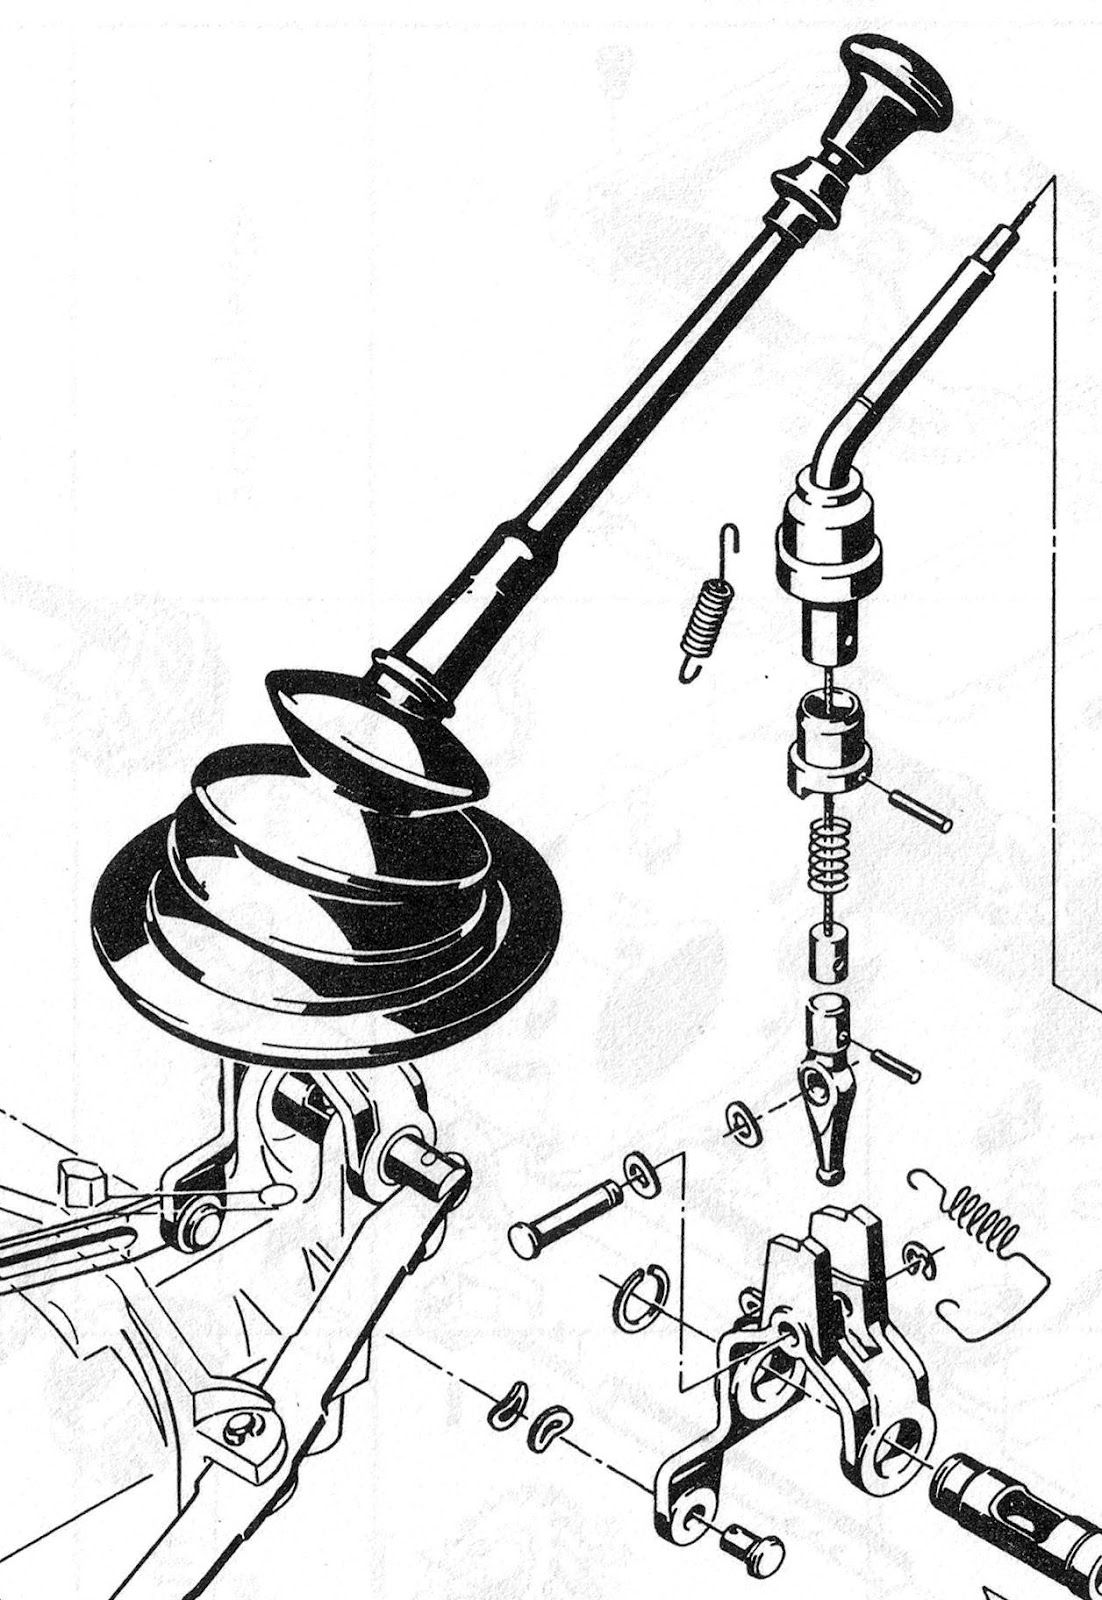 Opel manta bellows style gear lever gaiter